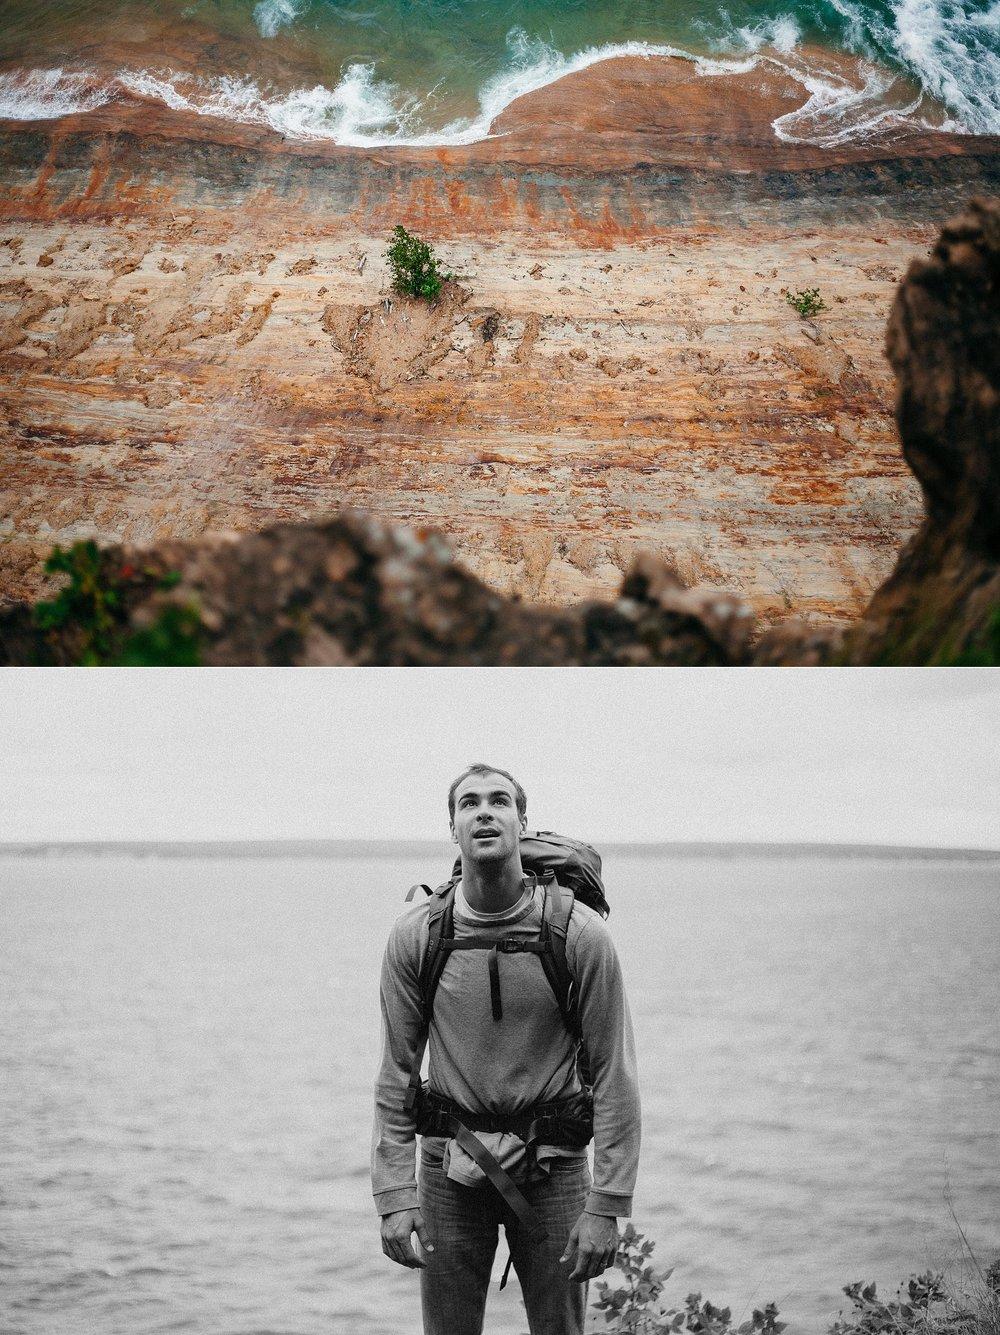 backpacking-michigan-upper-peninsula-pictured-rocks-camping-lake-superior_0026.jpg